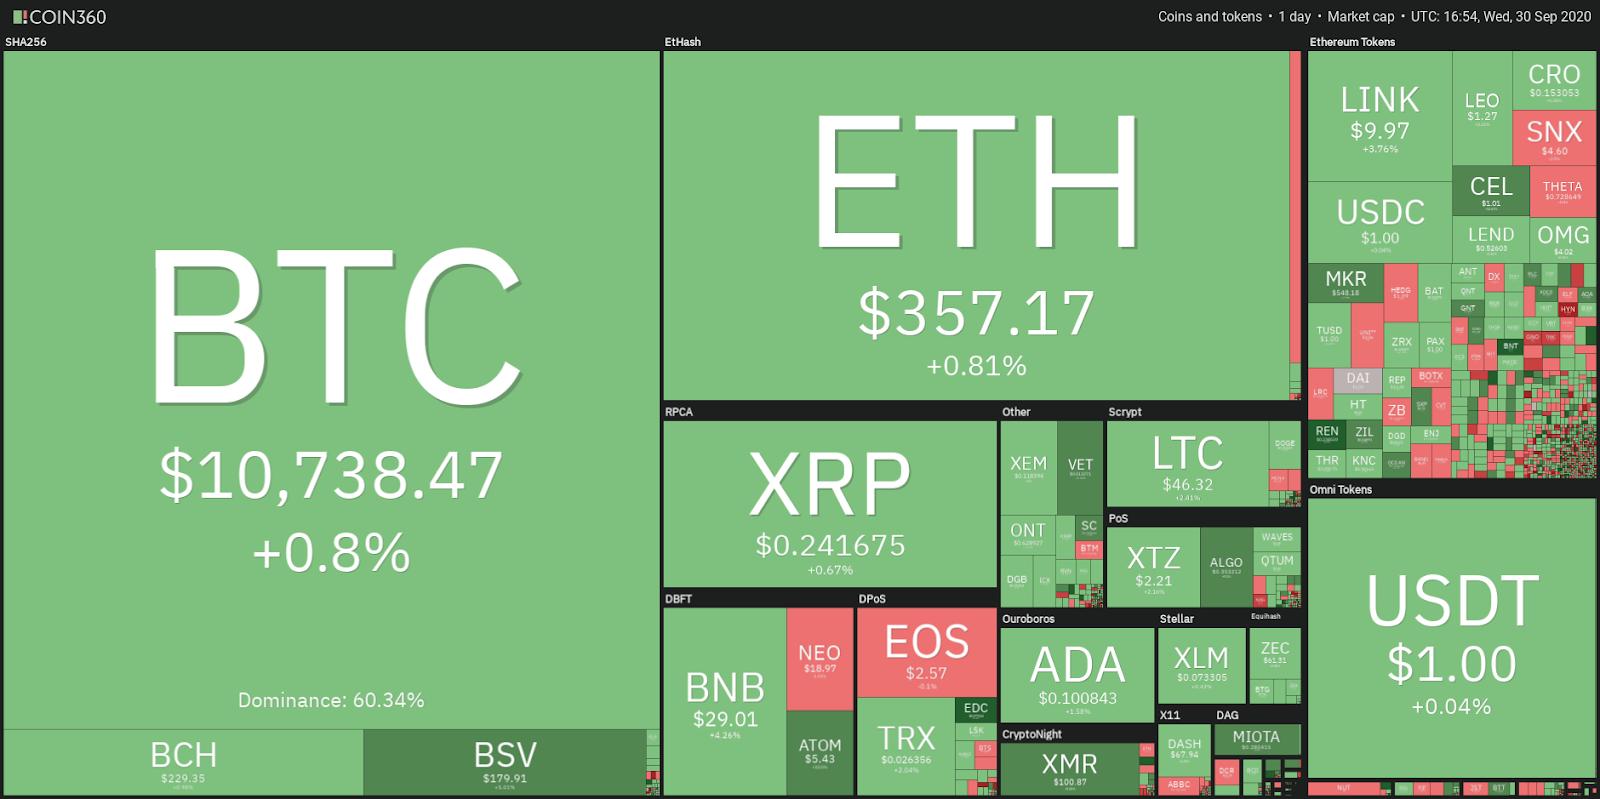 Price analysis 9/30: BTC, ETH, XRP, BCH, BNB, DOT, LINK, BSV, CRO, ADA